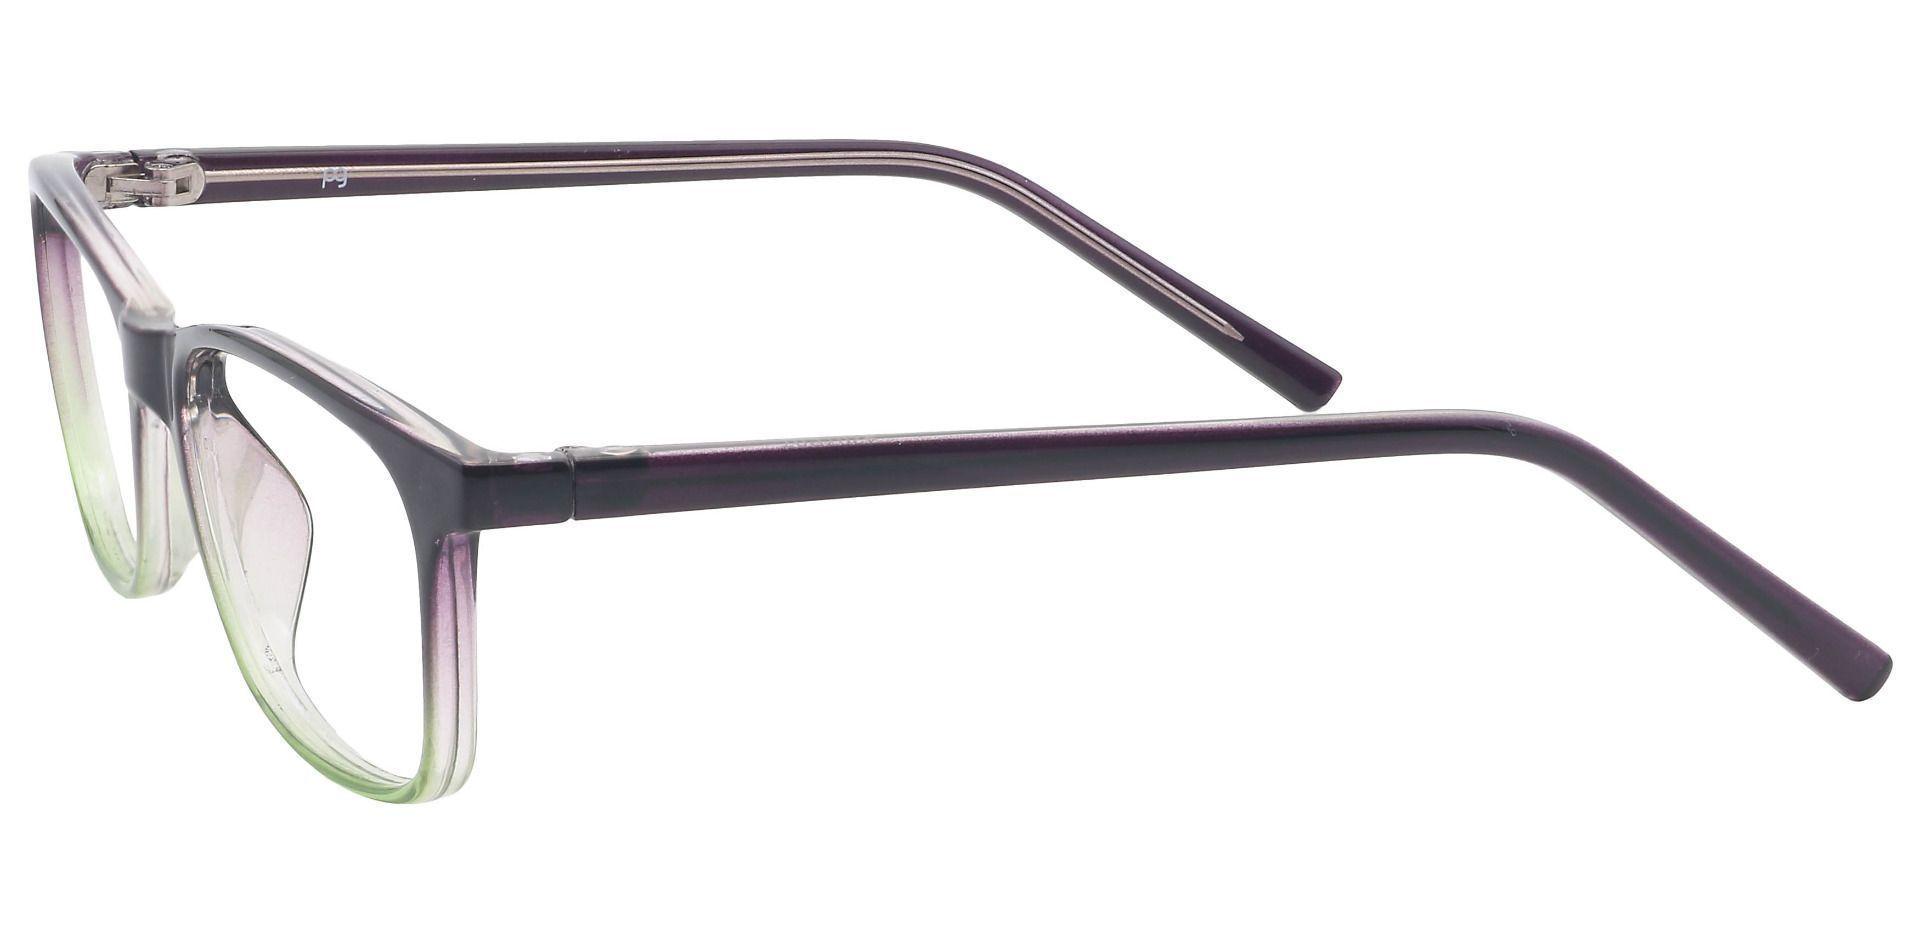 Safita Oval Lined Bifocal Glasses - Grape/kiwi Fade